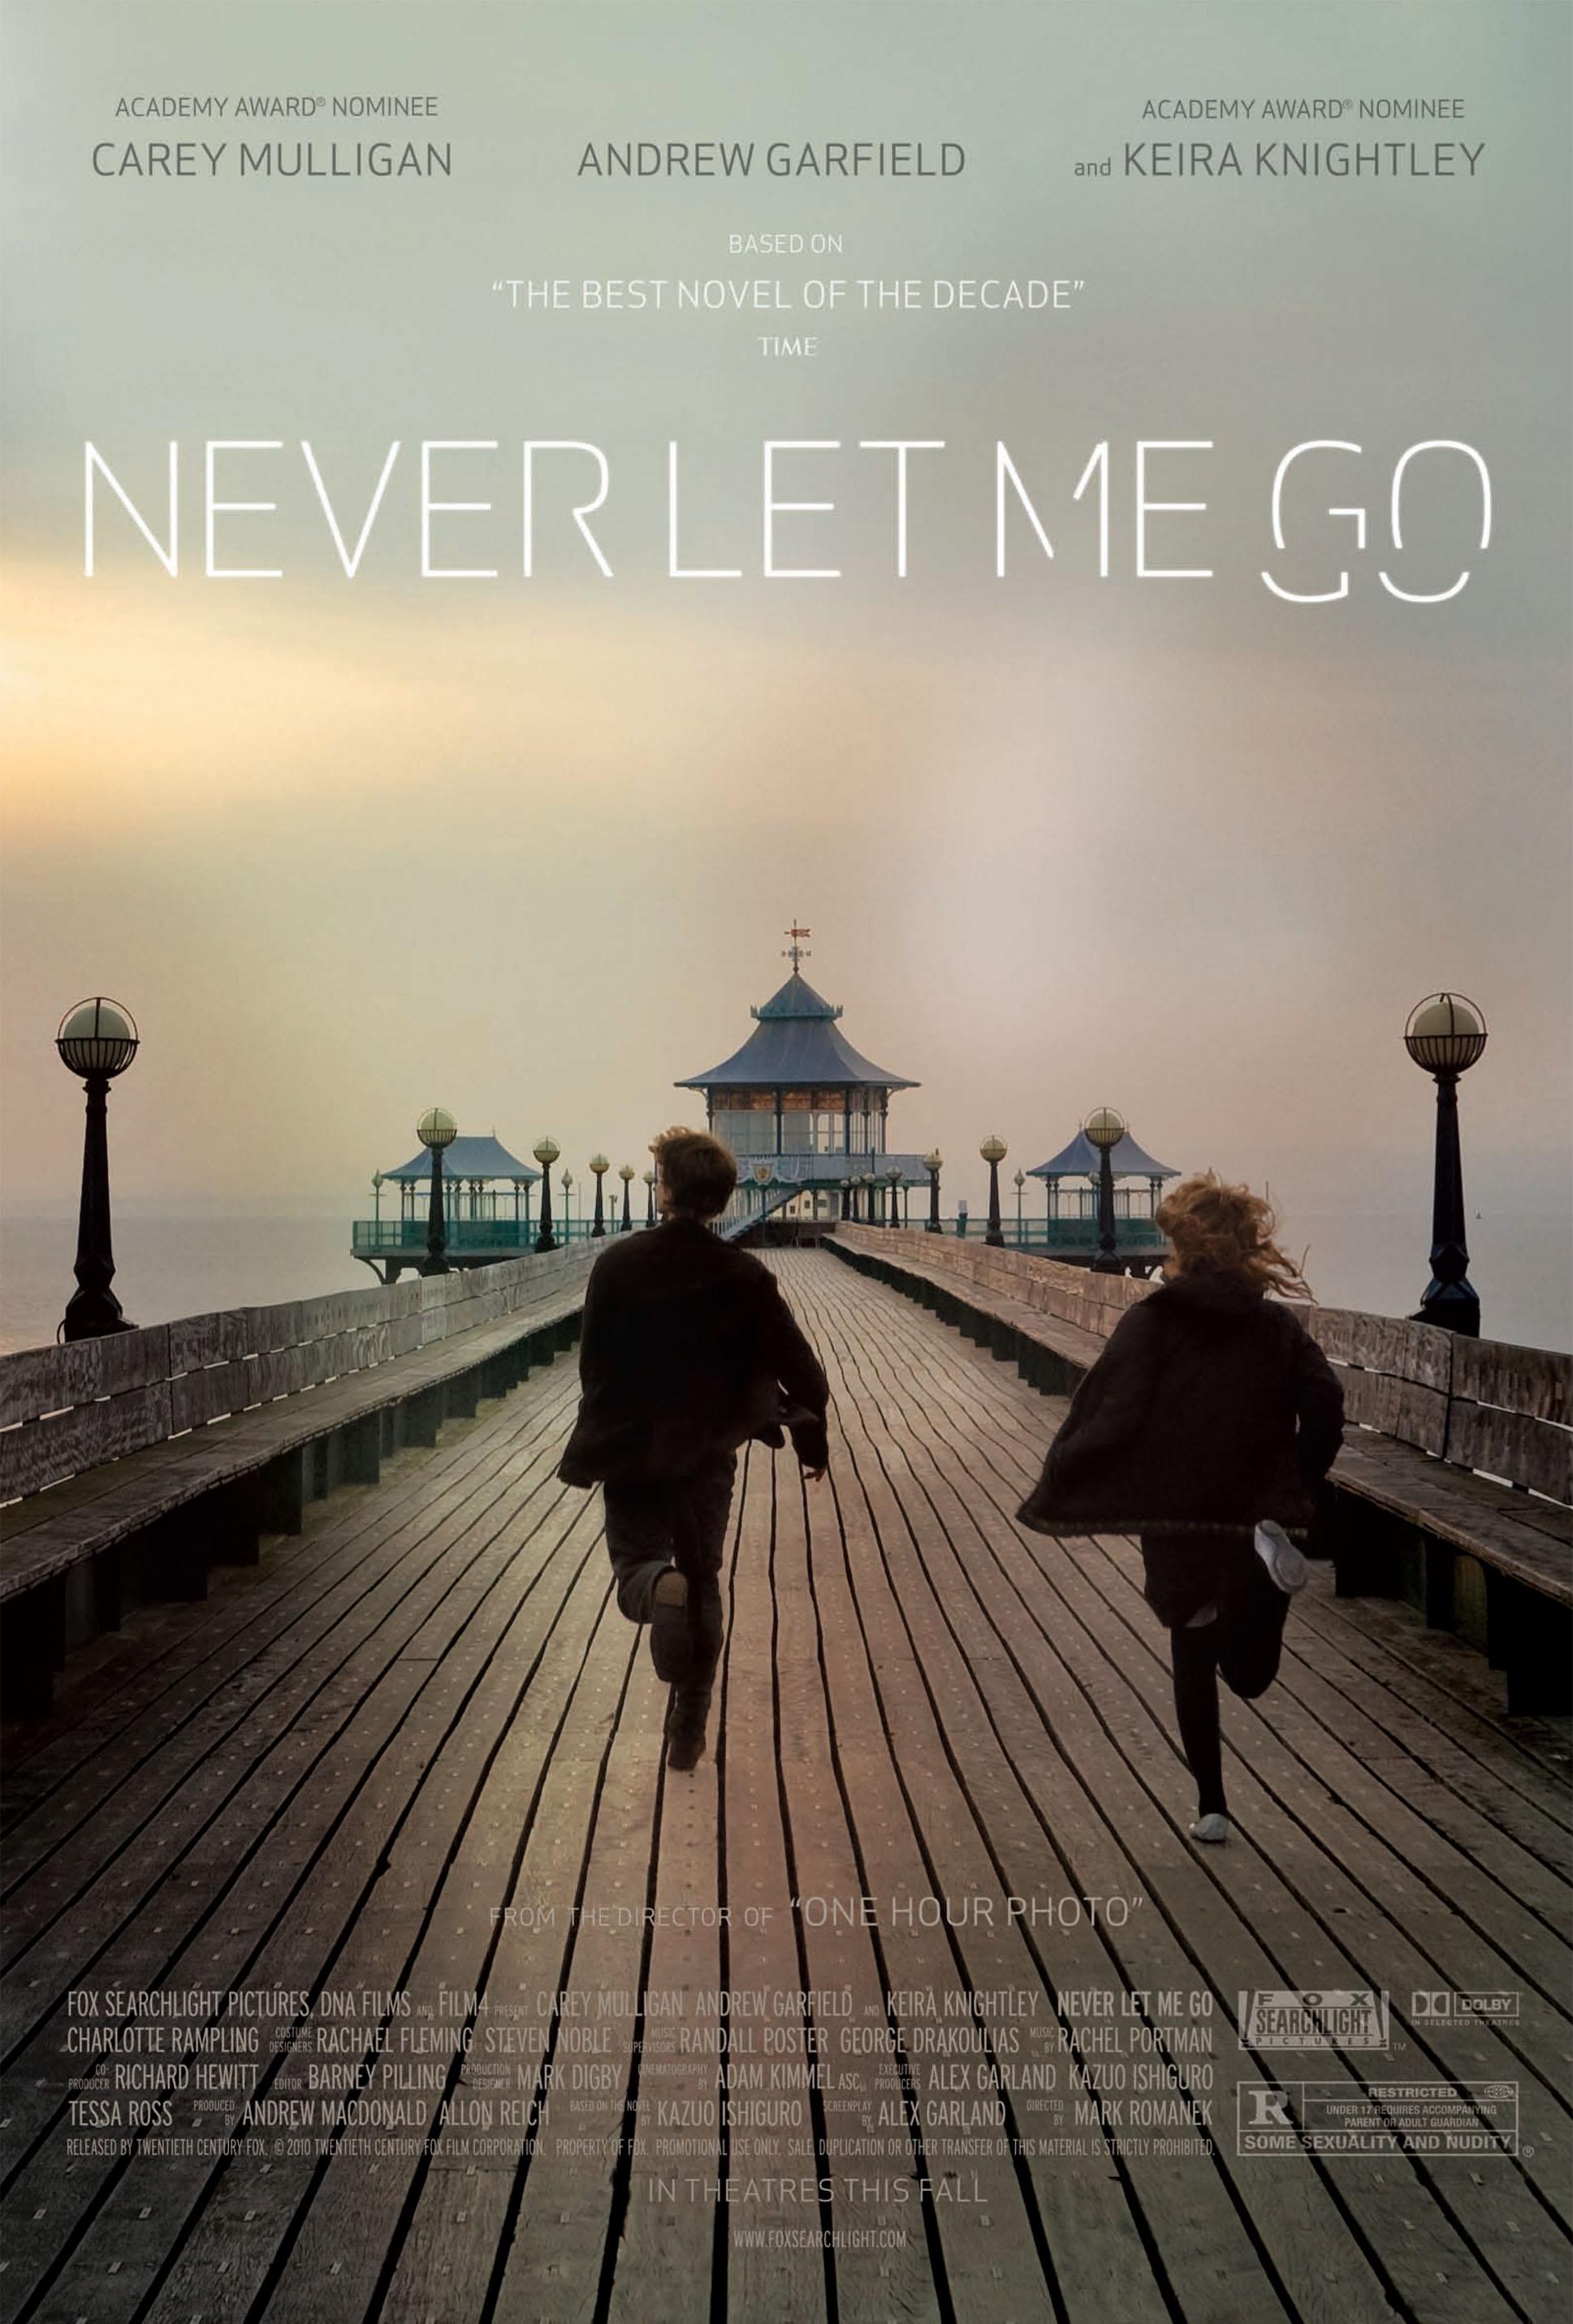 Never-Let-Me-Go-movie-poster-1.jpg